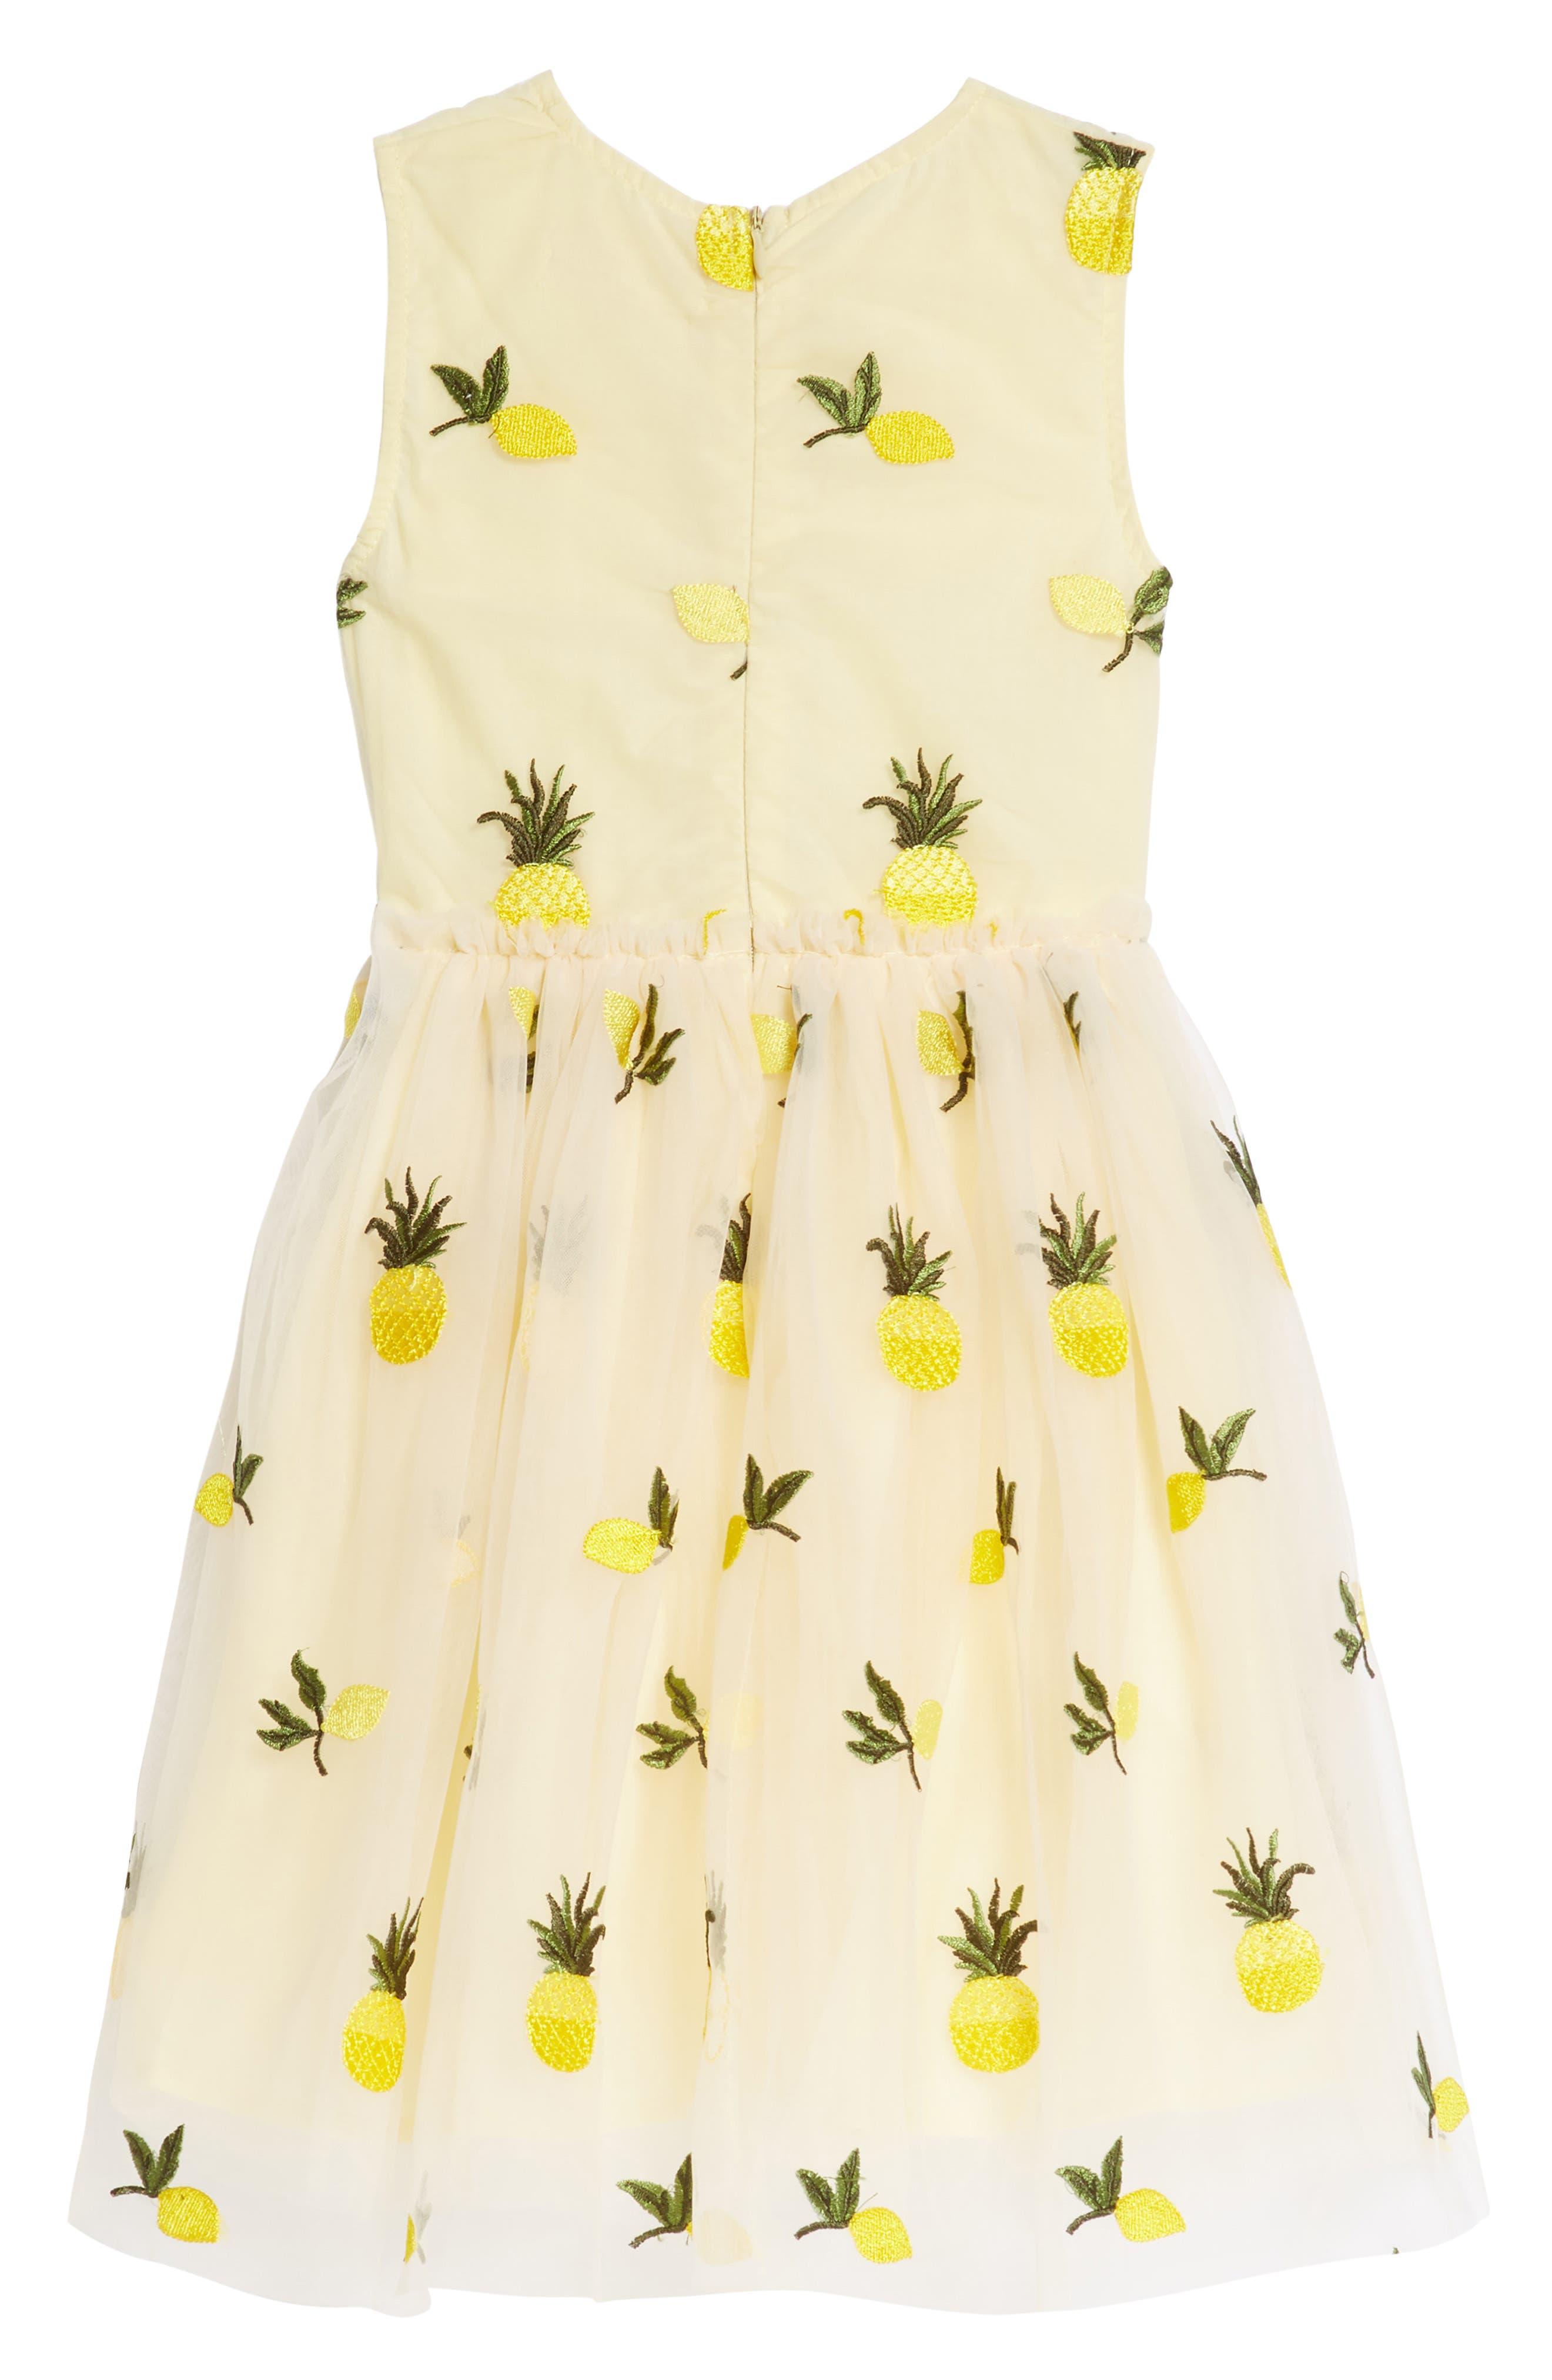 Pineapple & Lemon Embroidered Dress,                             Alternate thumbnail 2, color,                             Tan